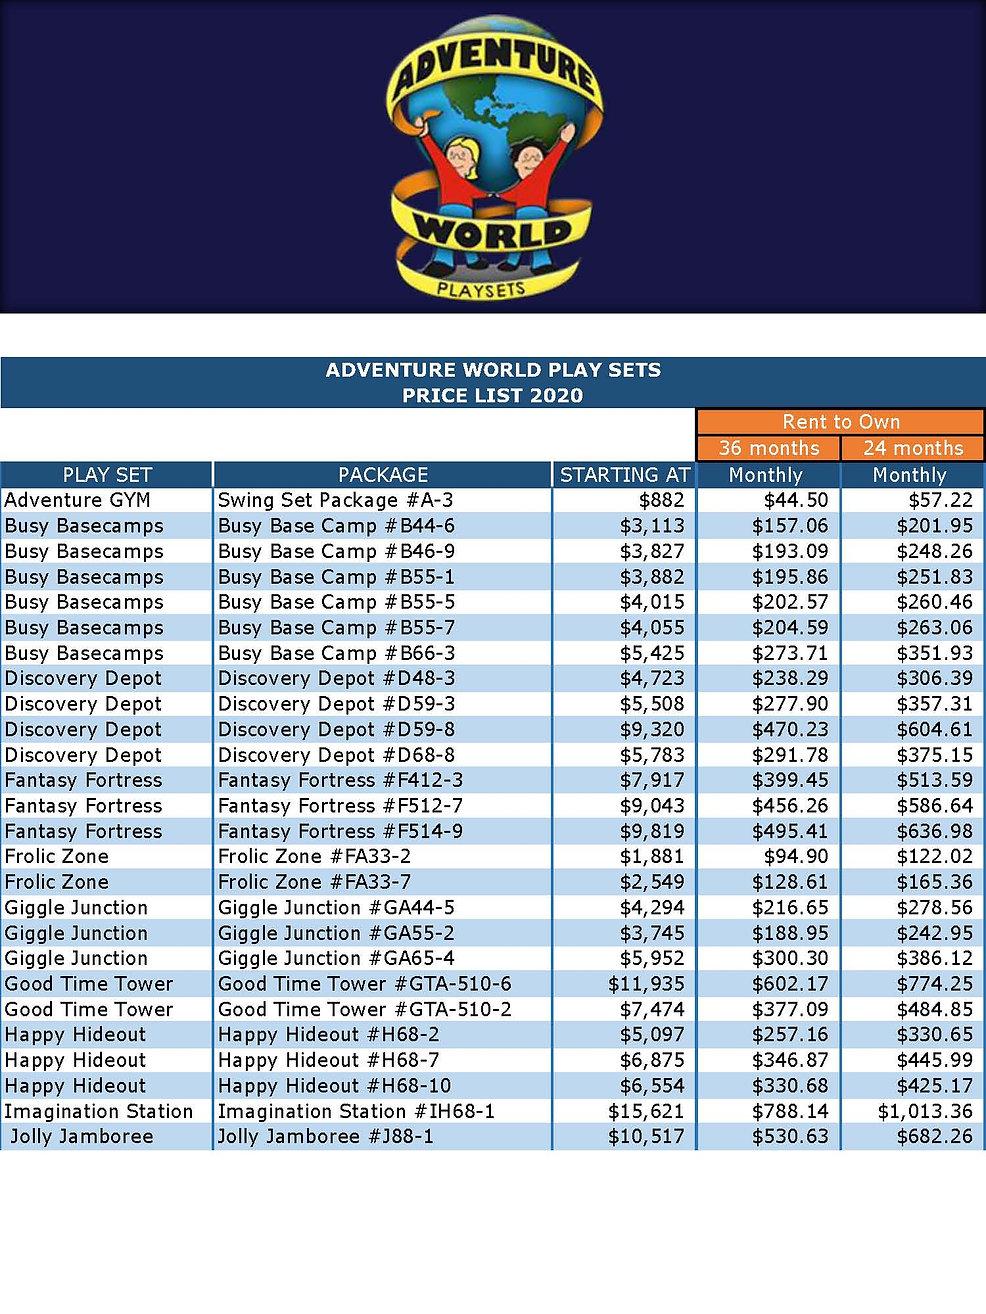 Swing Set Price List 2020 RTO (24-36) Ne